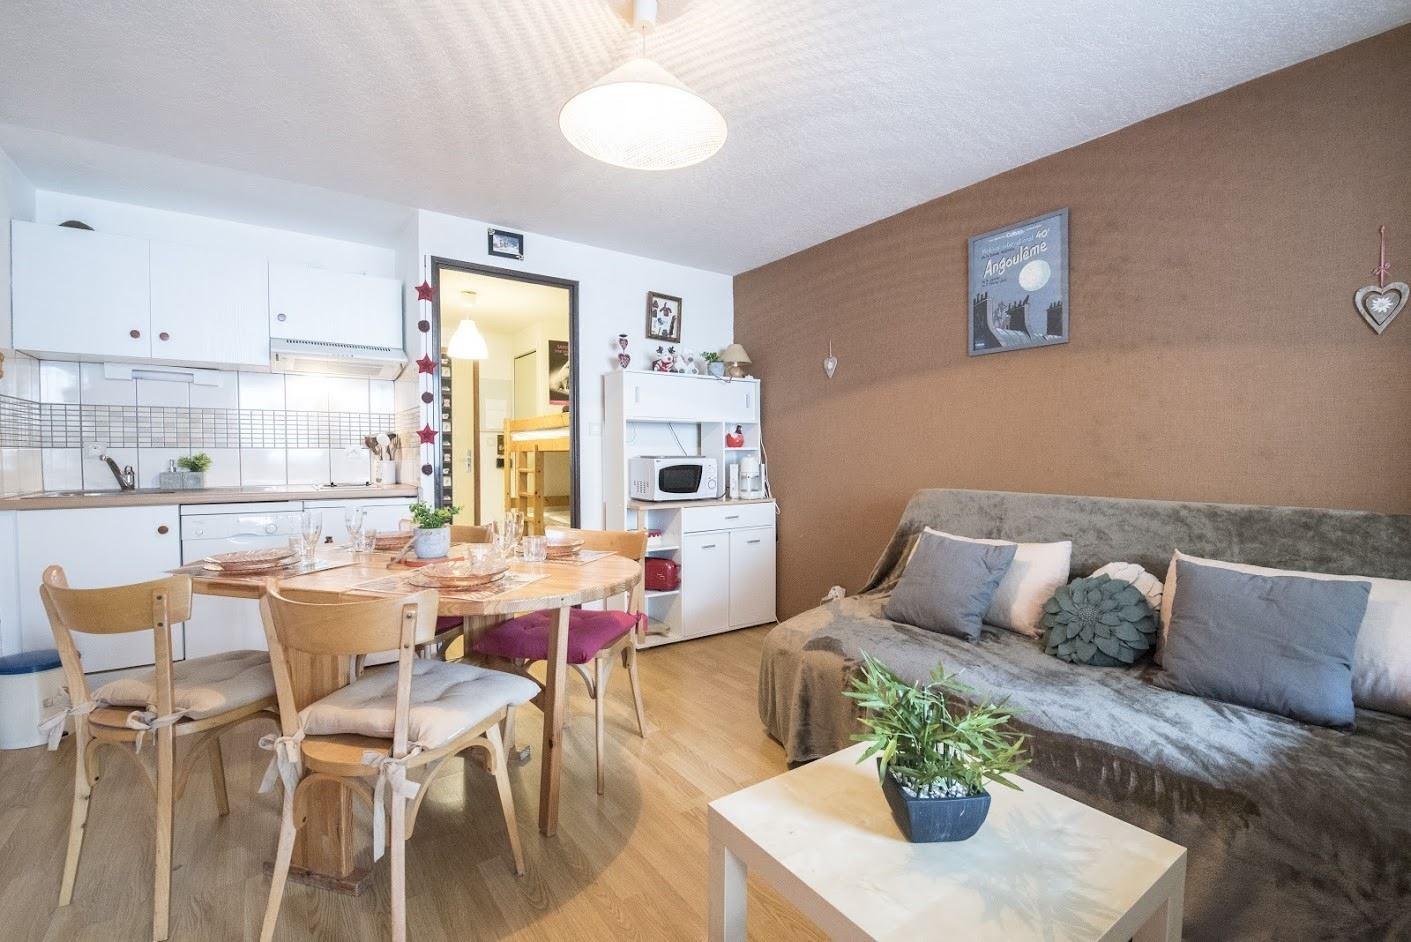 BEL AURE 3 BA3006 - Studio 2/4PTourisme  rooms  people